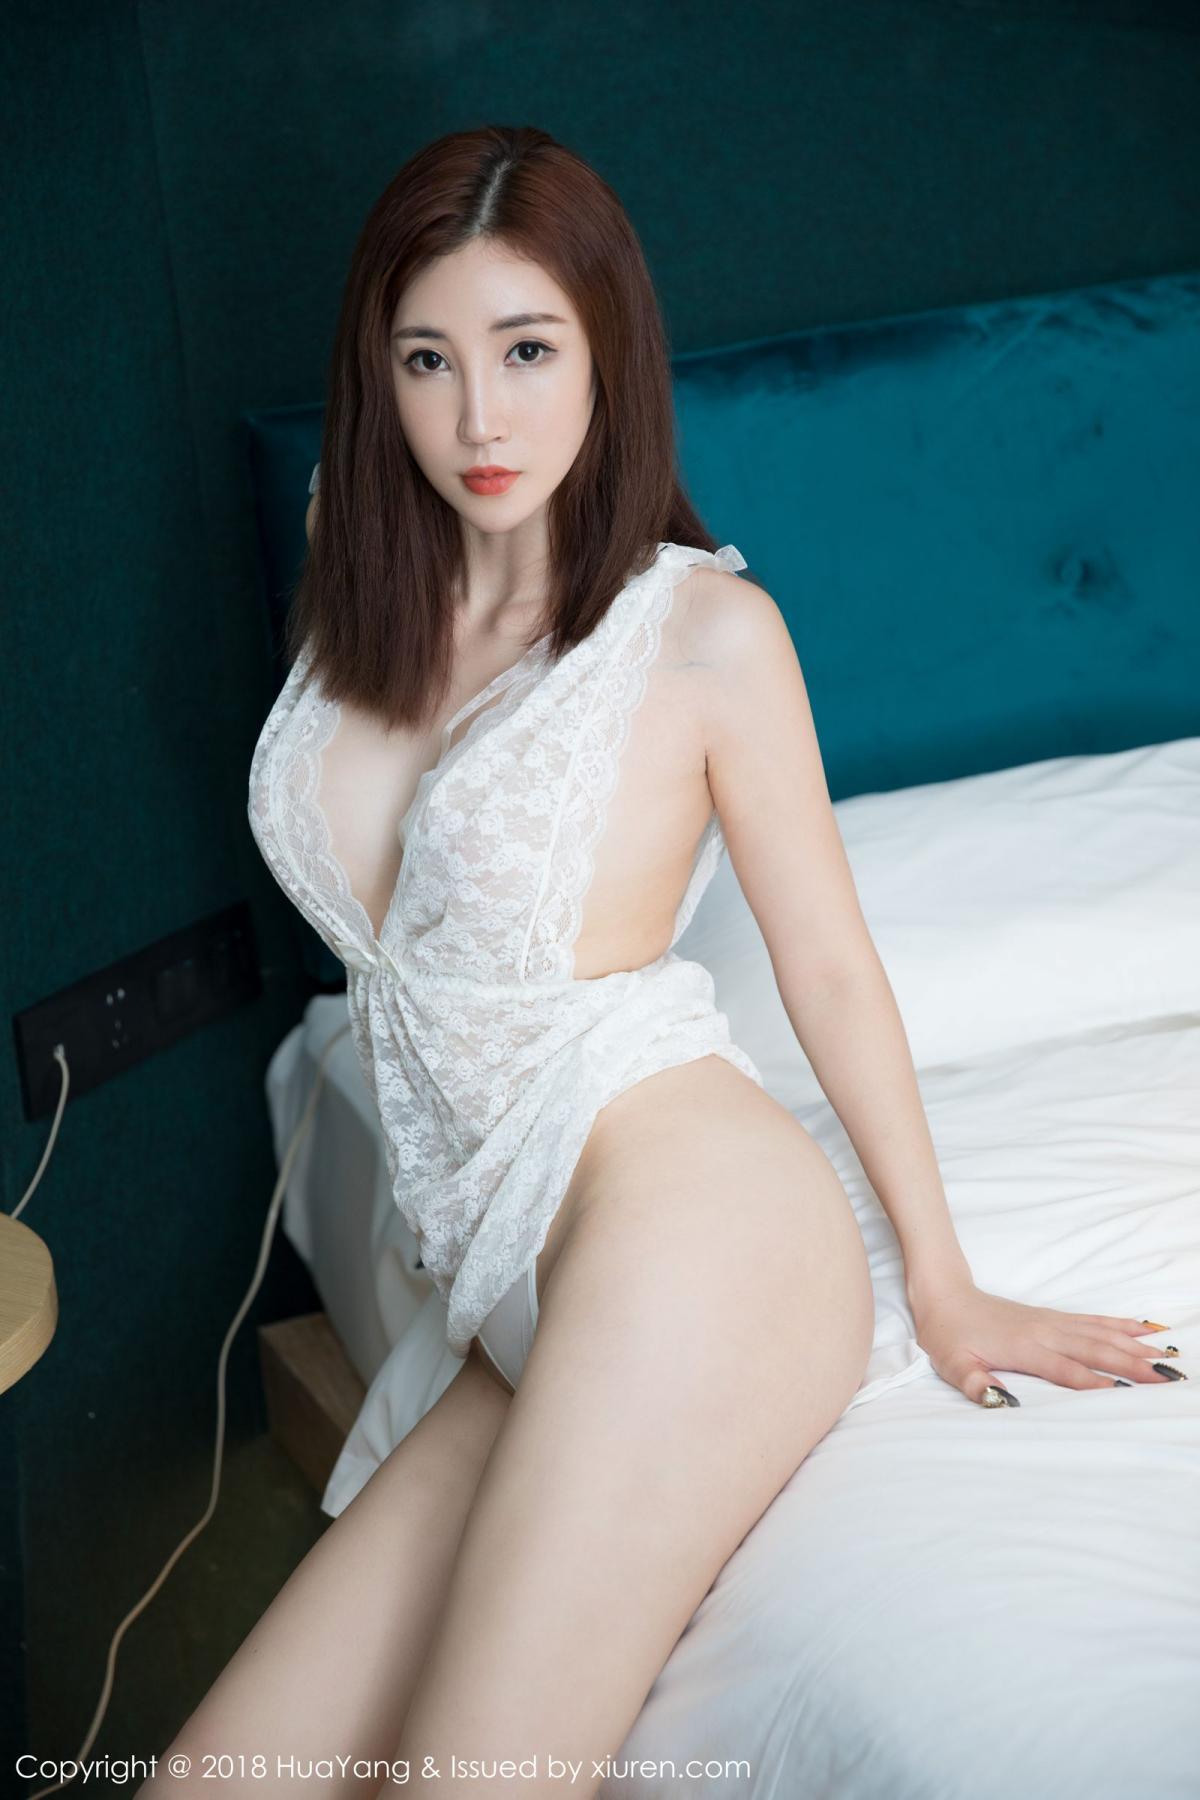 [Huayang] Vol.077 Sun Meng Yao 29P, Adult, Big Booty, HuaYang, Sun Meng Yao, Underwear